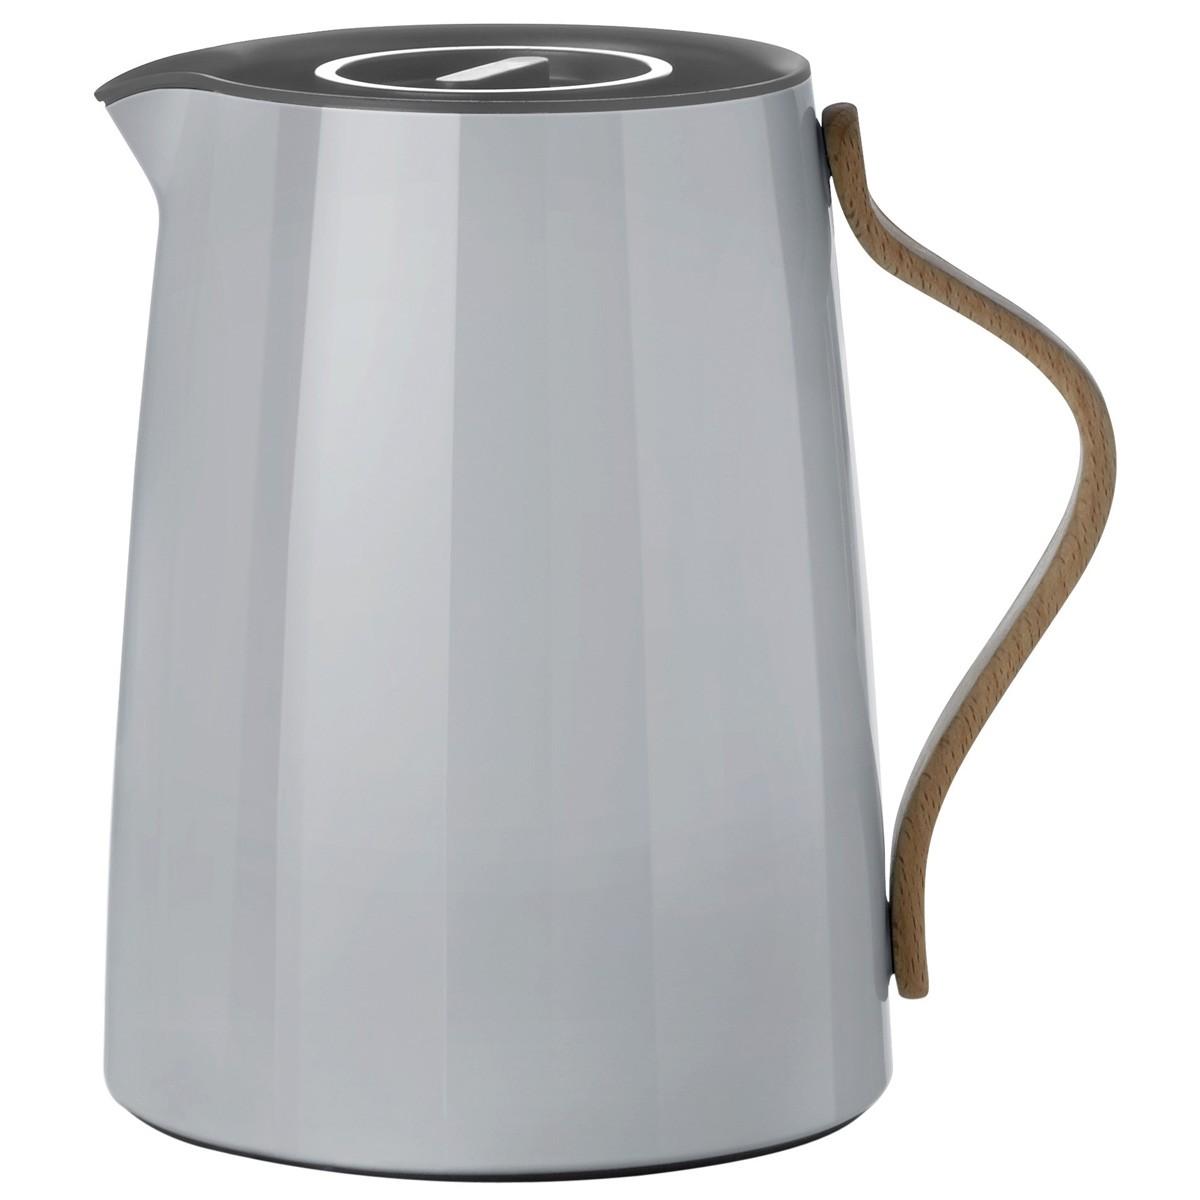 stelton emma isolierkanne f r tee 1 liter grau speisen servieren kannen isolierkannen. Black Bedroom Furniture Sets. Home Design Ideas